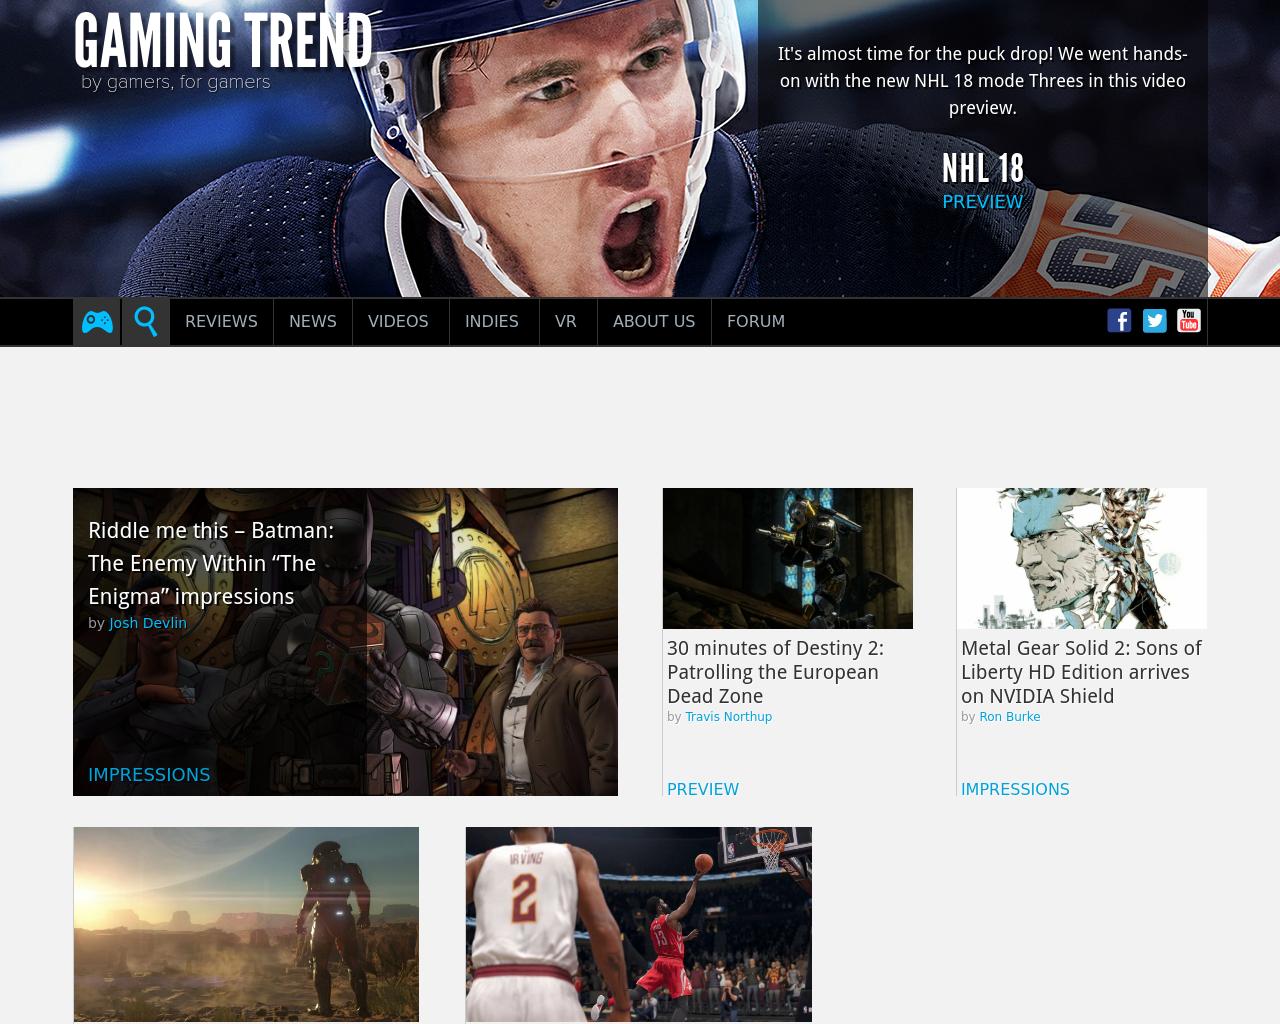 Gaming-Trend-Advertising-Reviews-Pricing